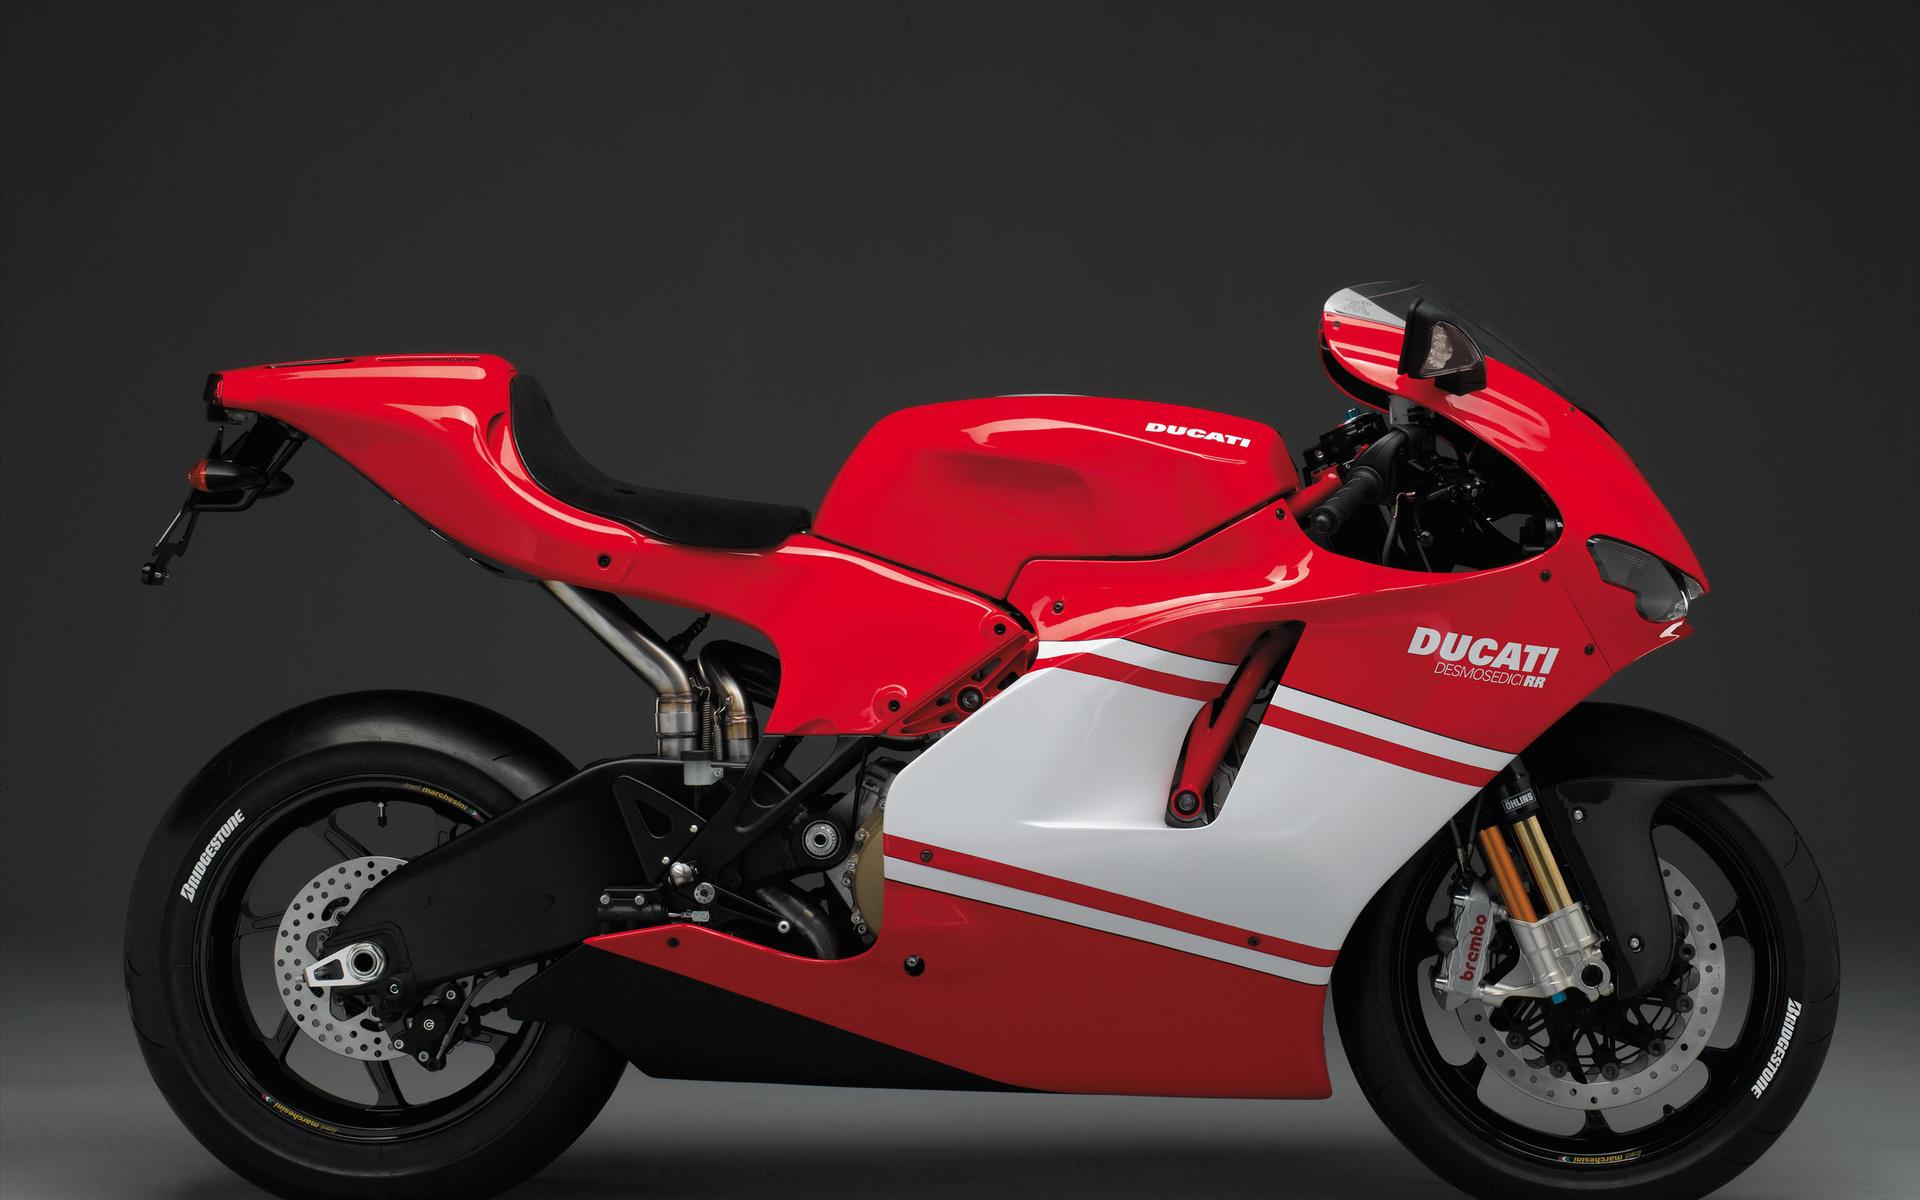 красный байк, фото, мотоцикл